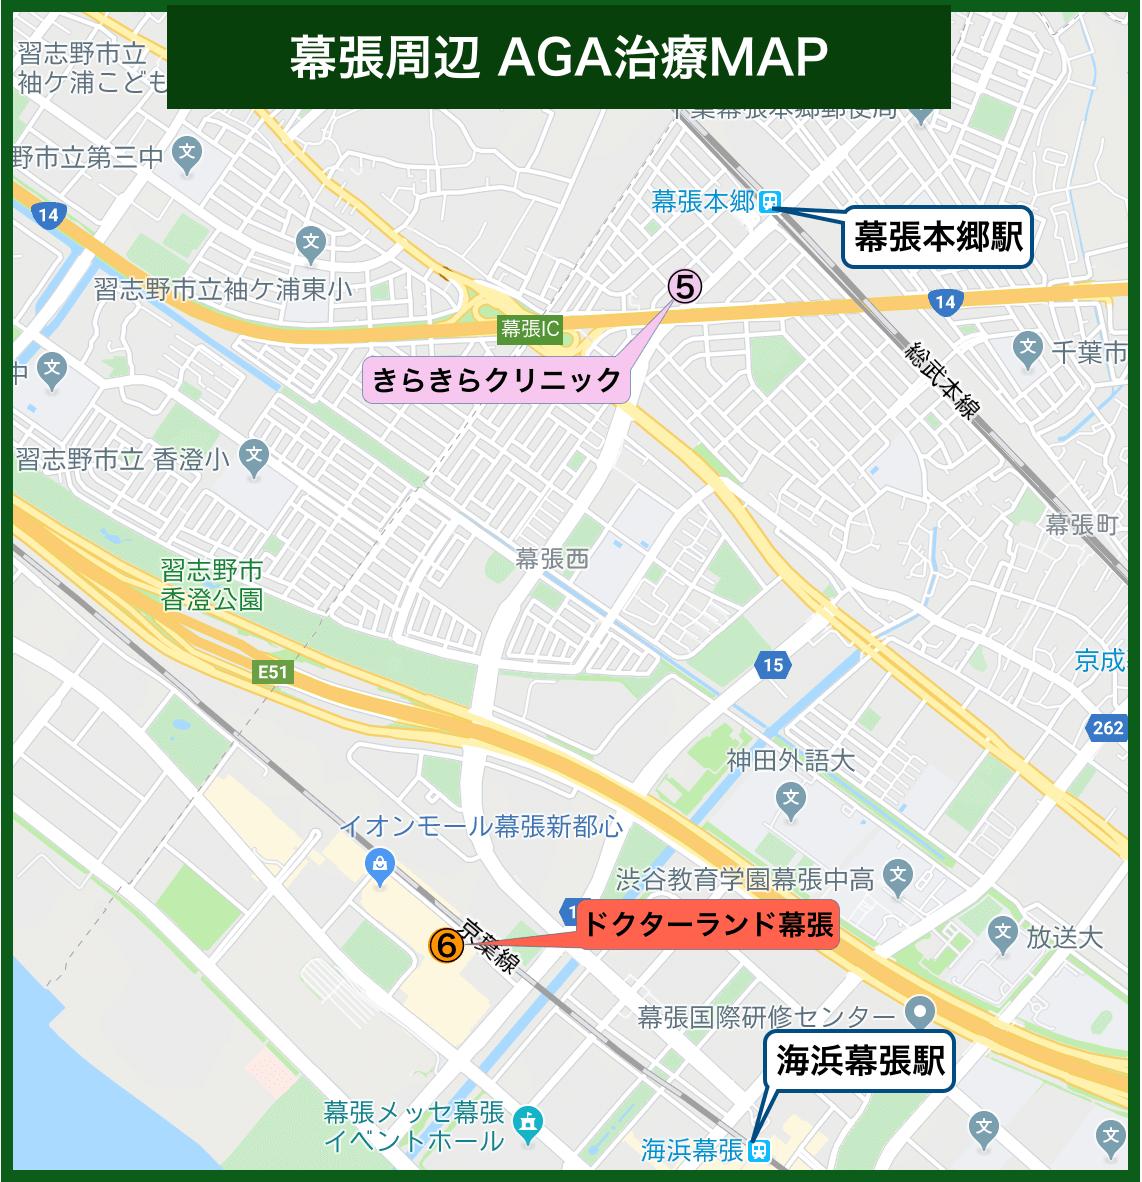 幕張周辺 AGA治療MAP